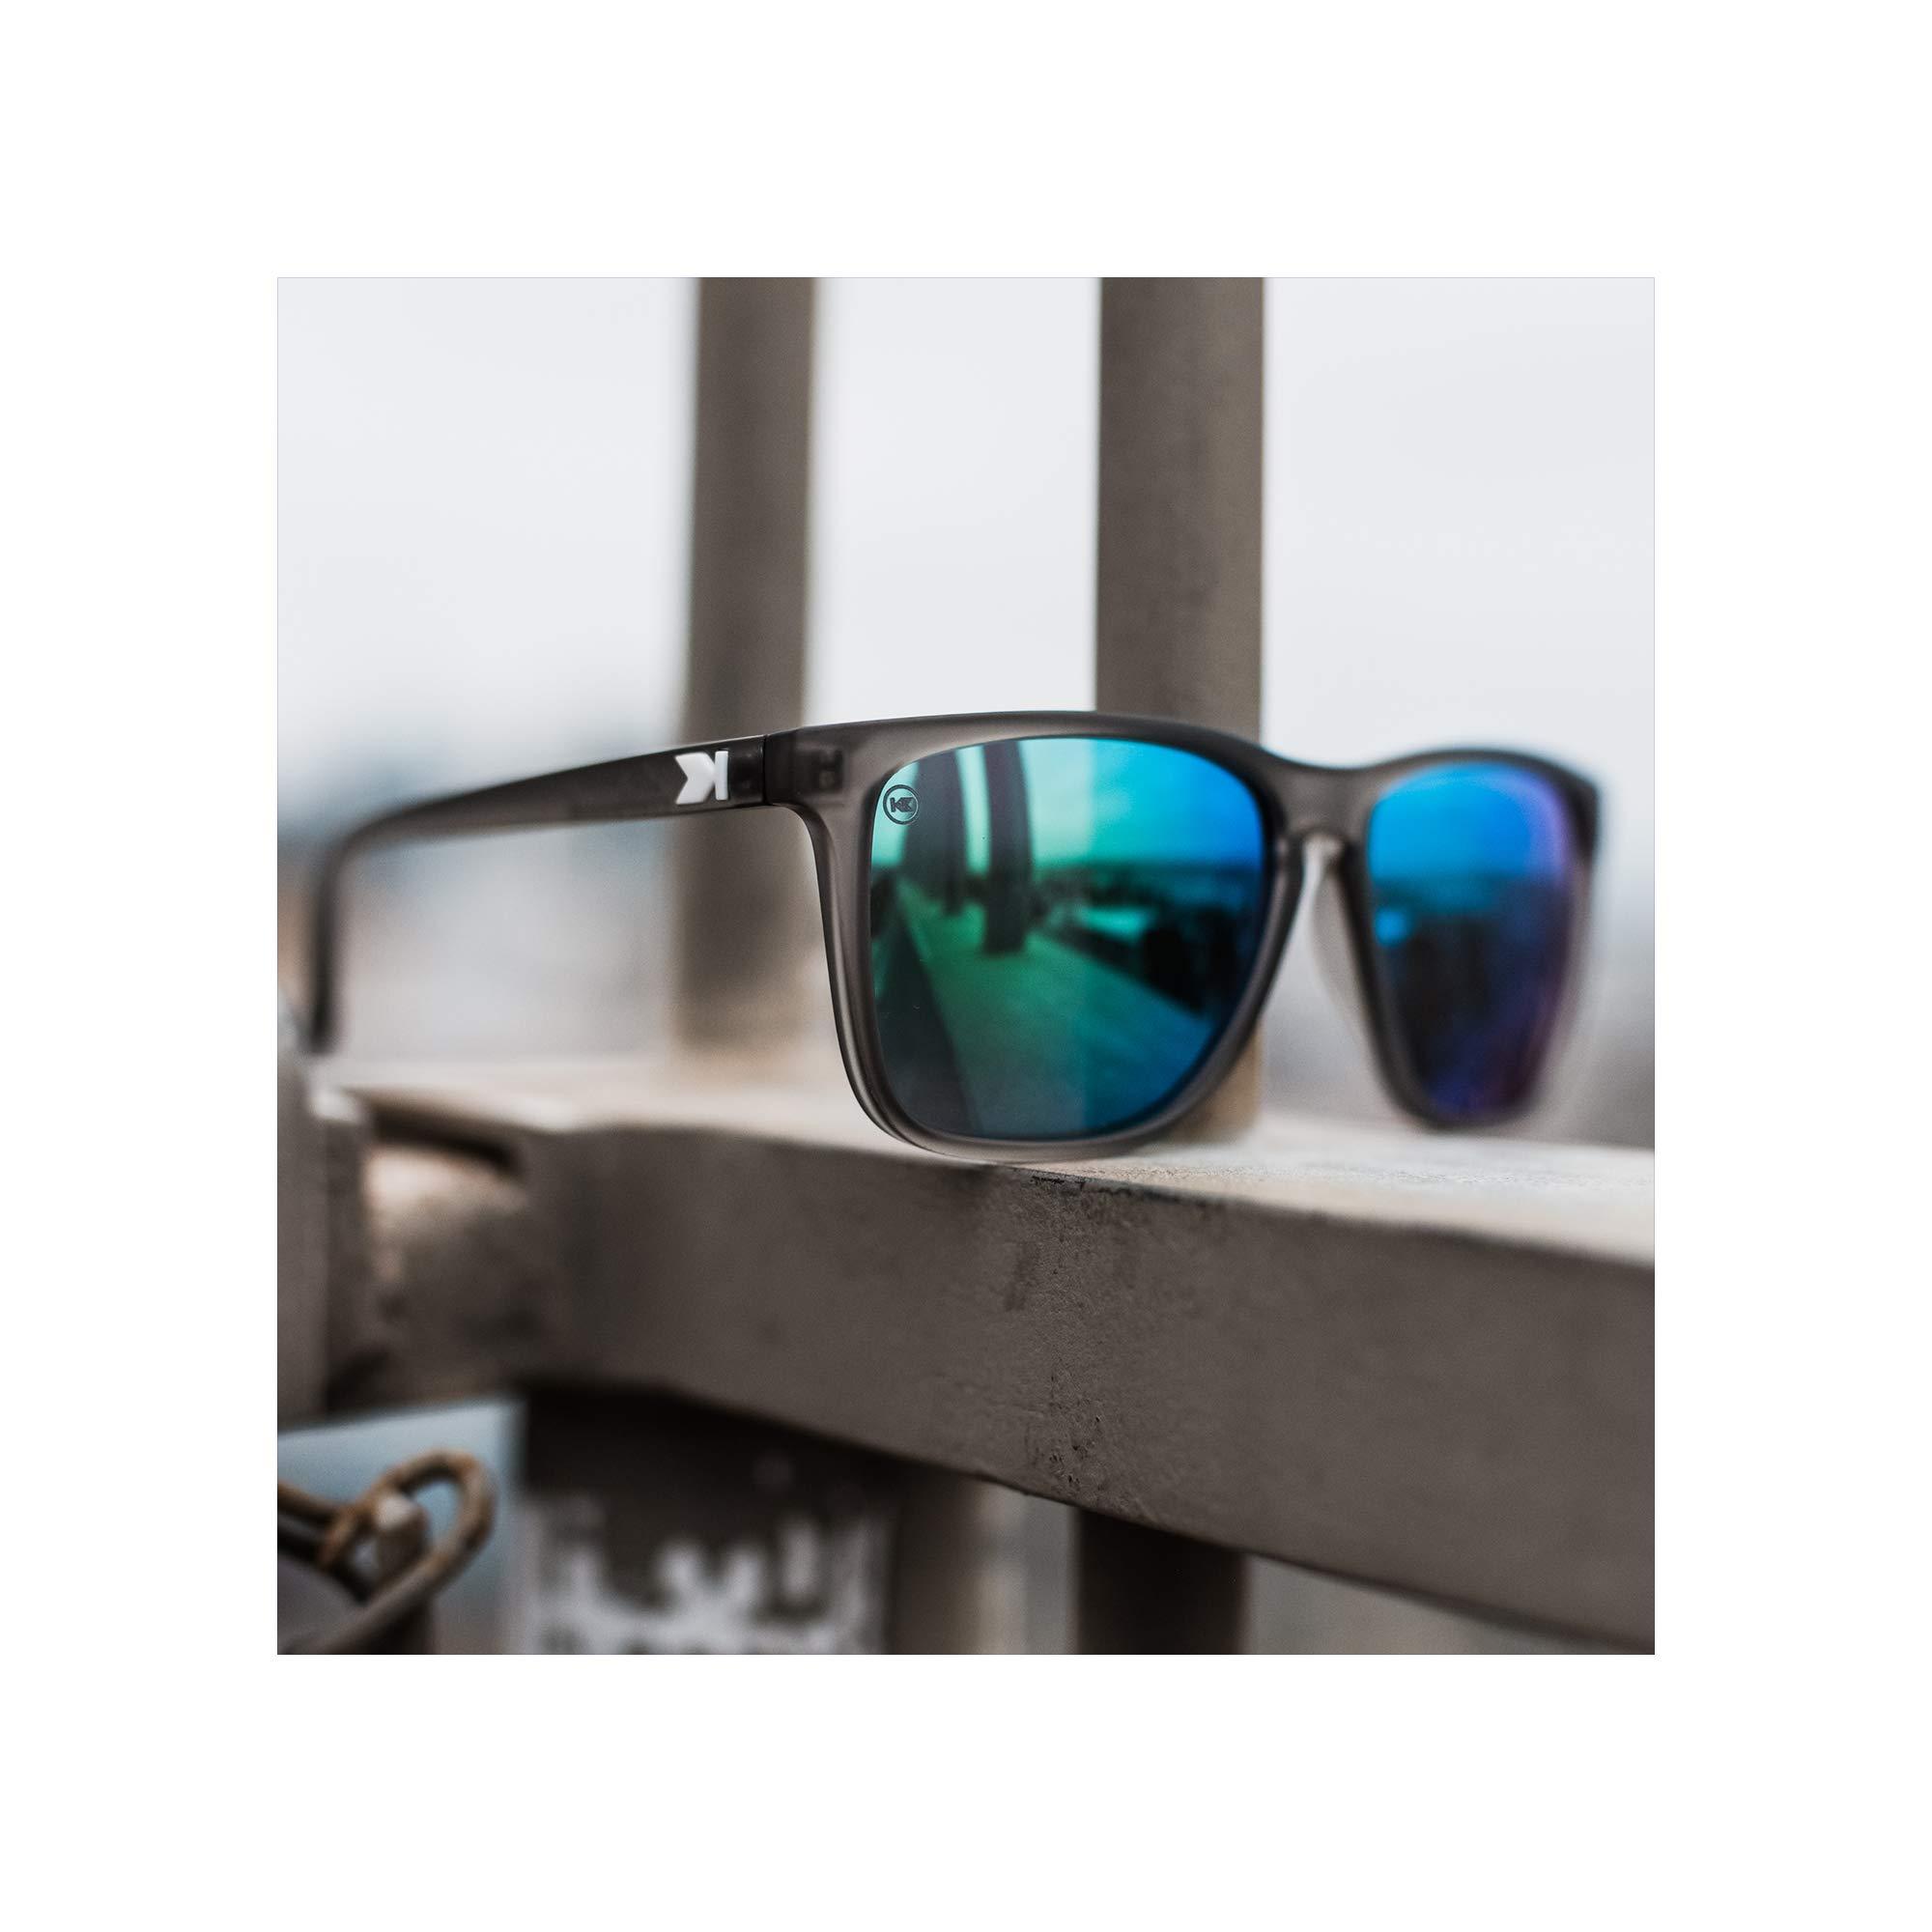 23c75ec9fe Knockaround Fast Lanes Unisex Sunglasses With UV400 Protection ...